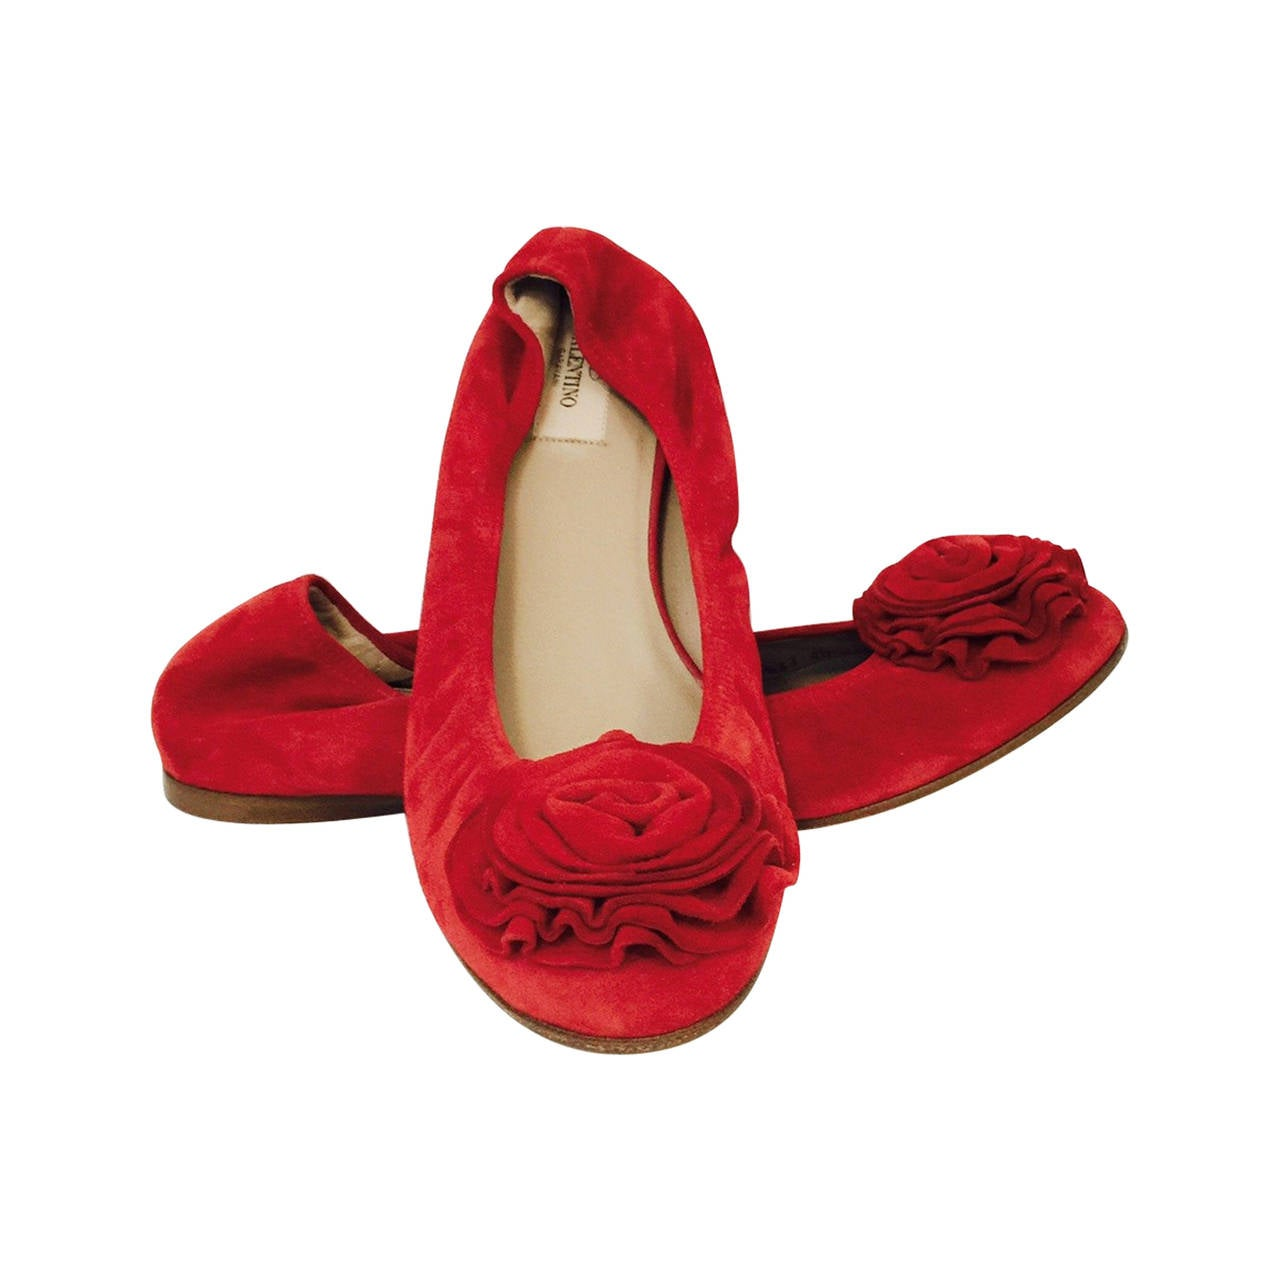 New Valentino Garavani Red Suede Ballerina Flats 1